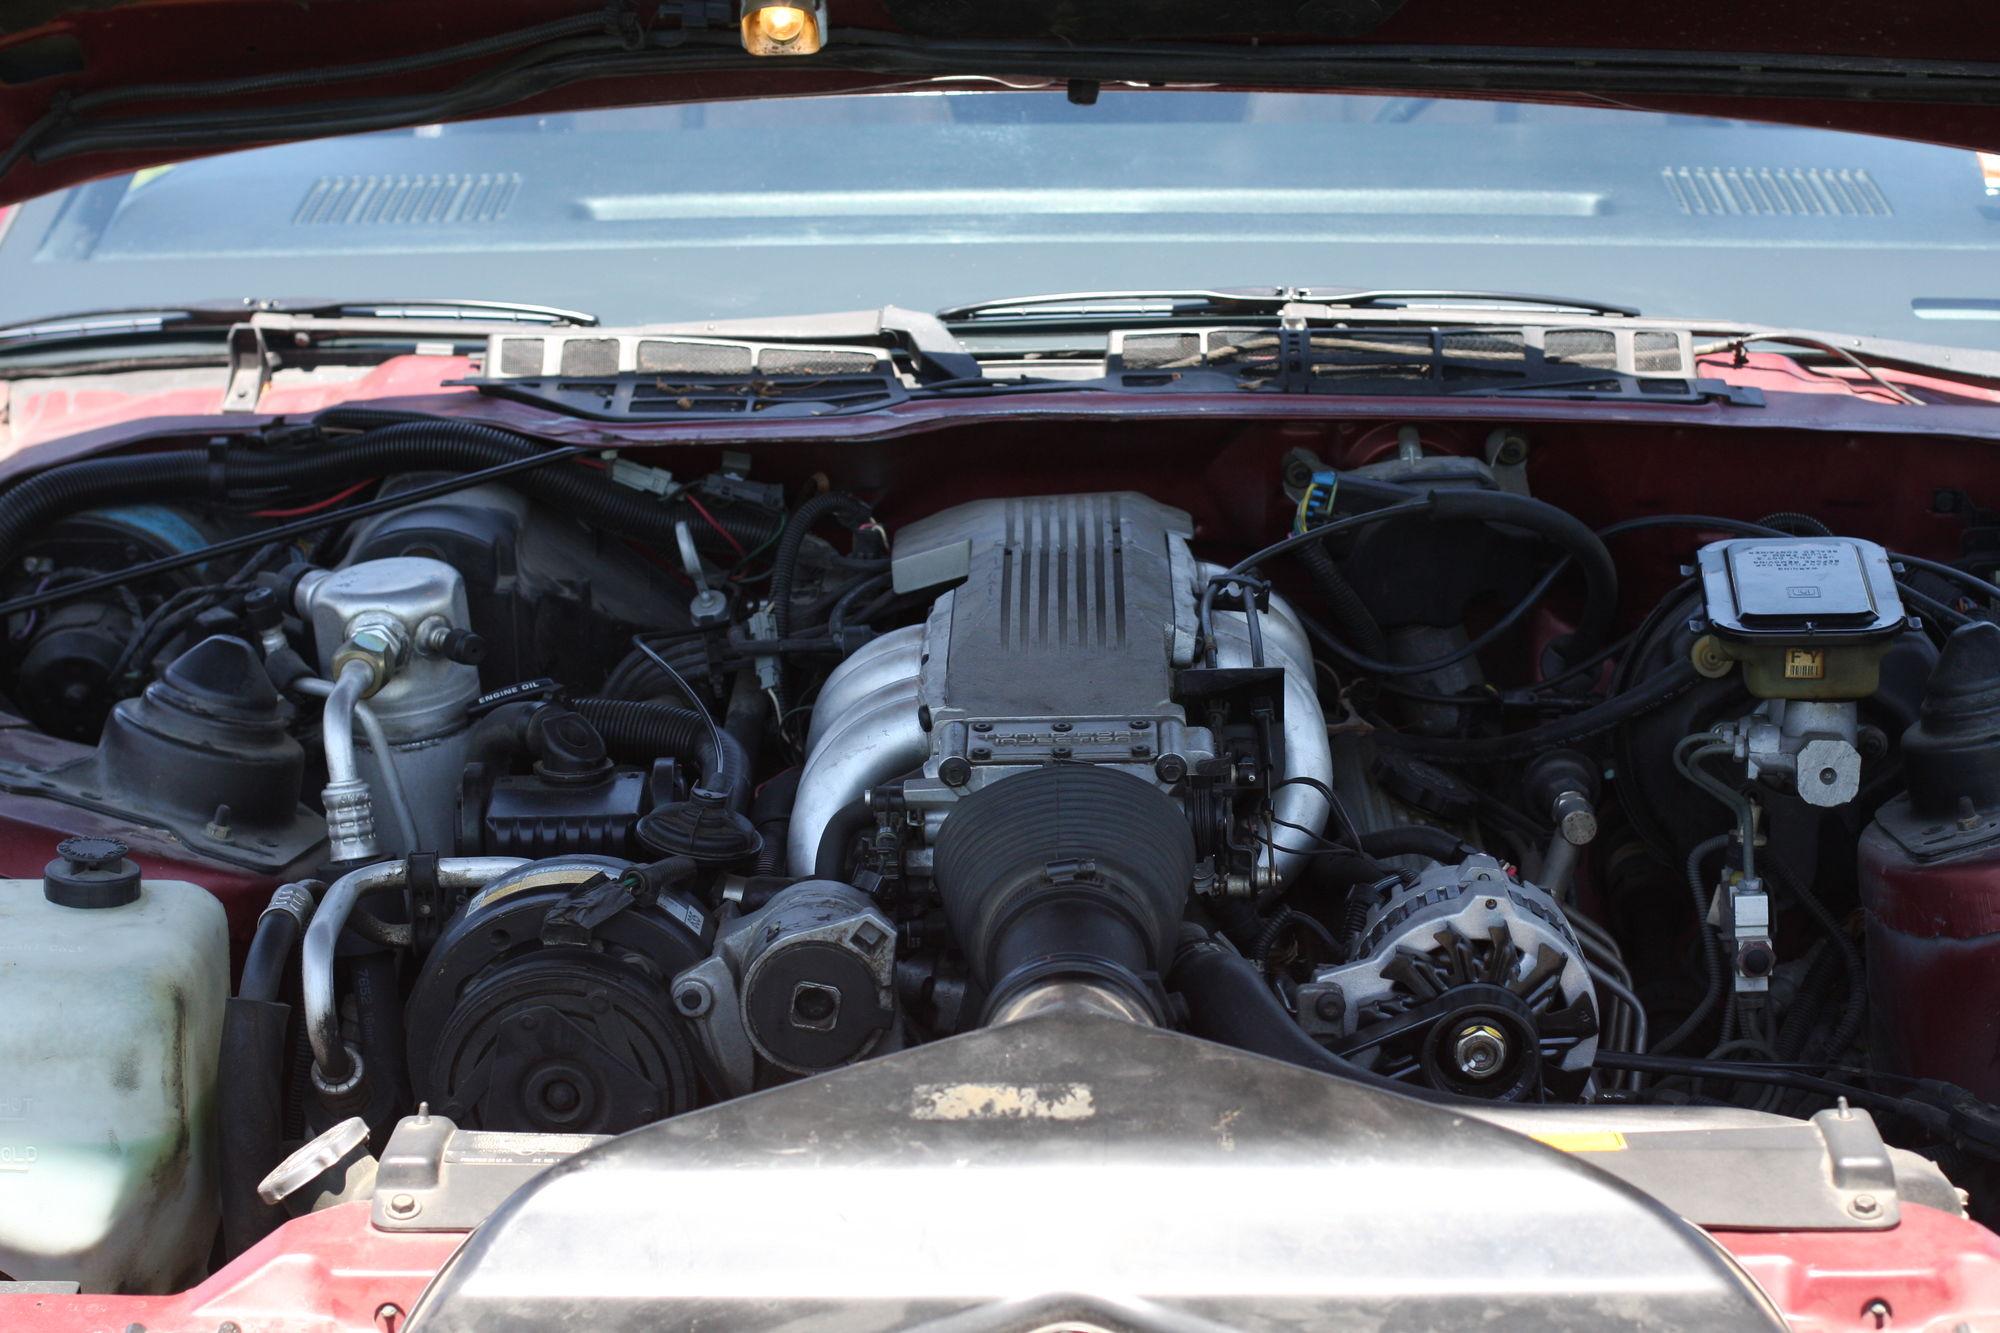 1988 Chevy Camaro Iroc Z 5 7 L98 All Original 56